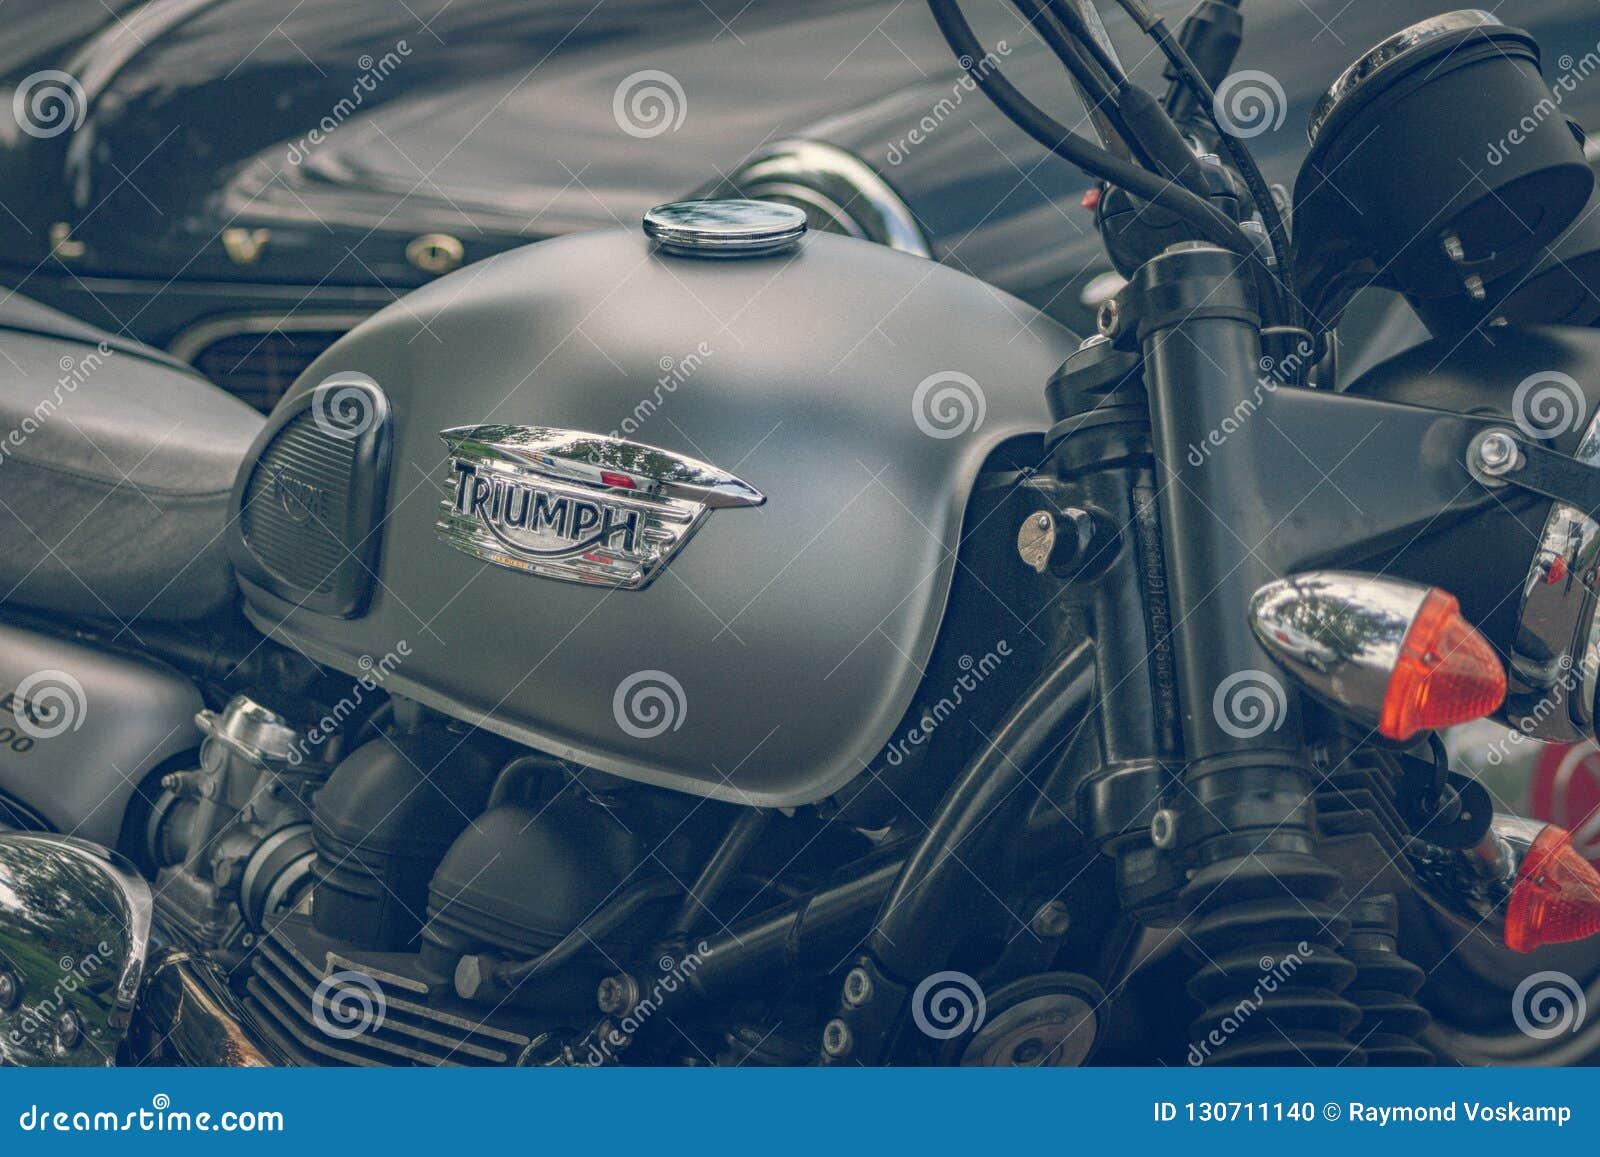 ROTTERDAM, NETHERLANDS - SEPTEMBER 2 2018: Motorcycles are shining at Dutch motor event  Rotterdam Dirt Ride